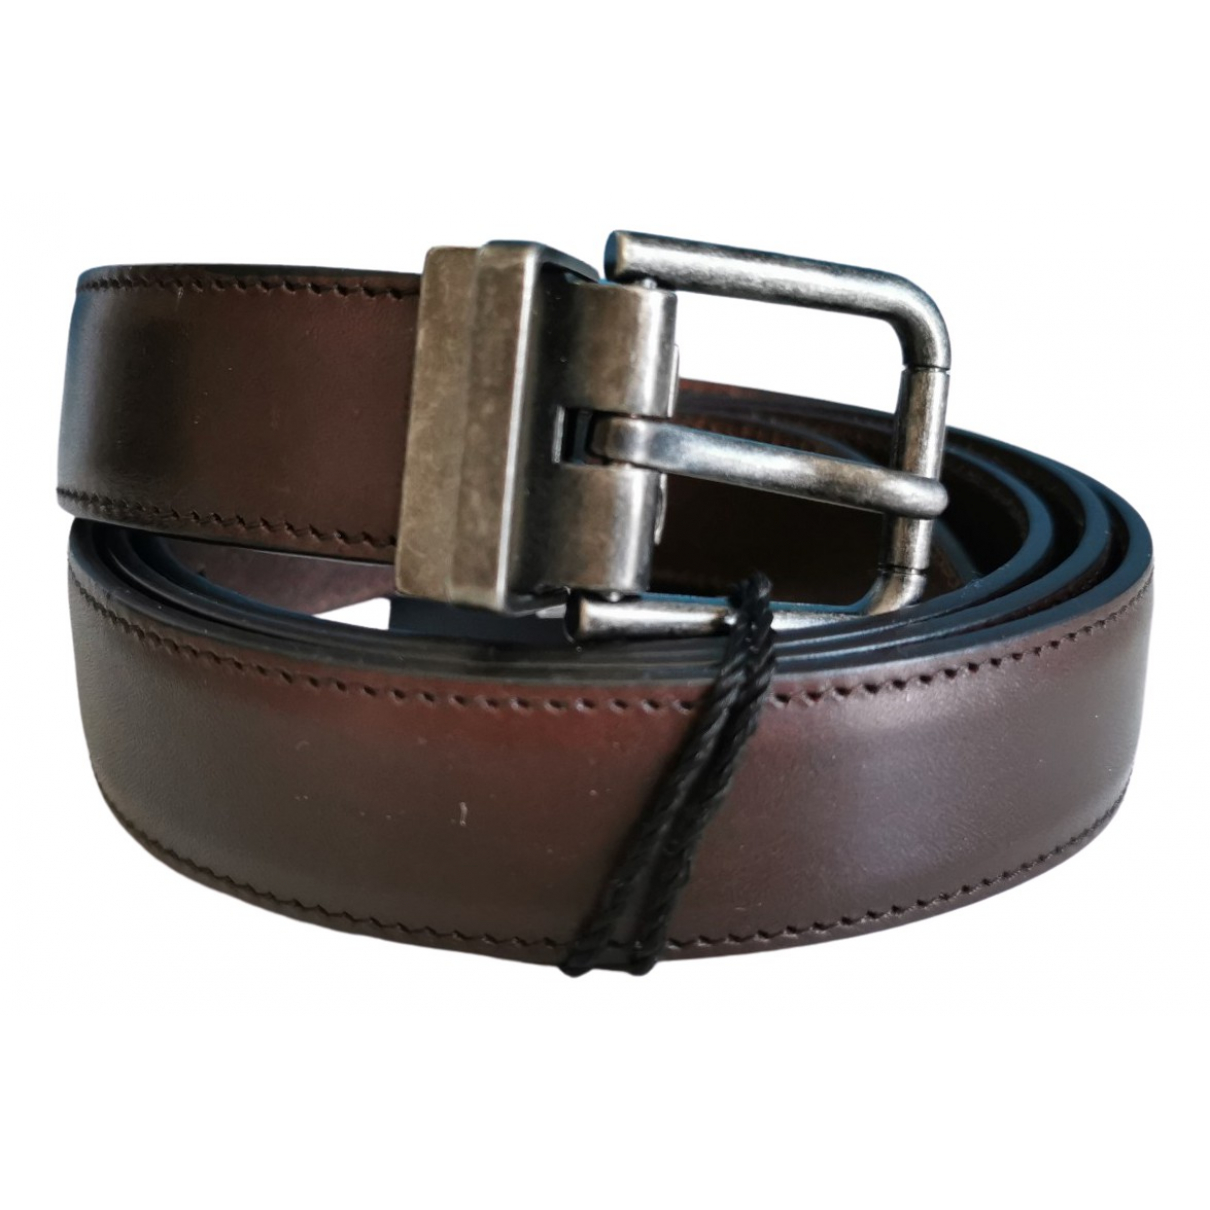 Dolce & Gabbana \N Brown Leather belt for Men XL international